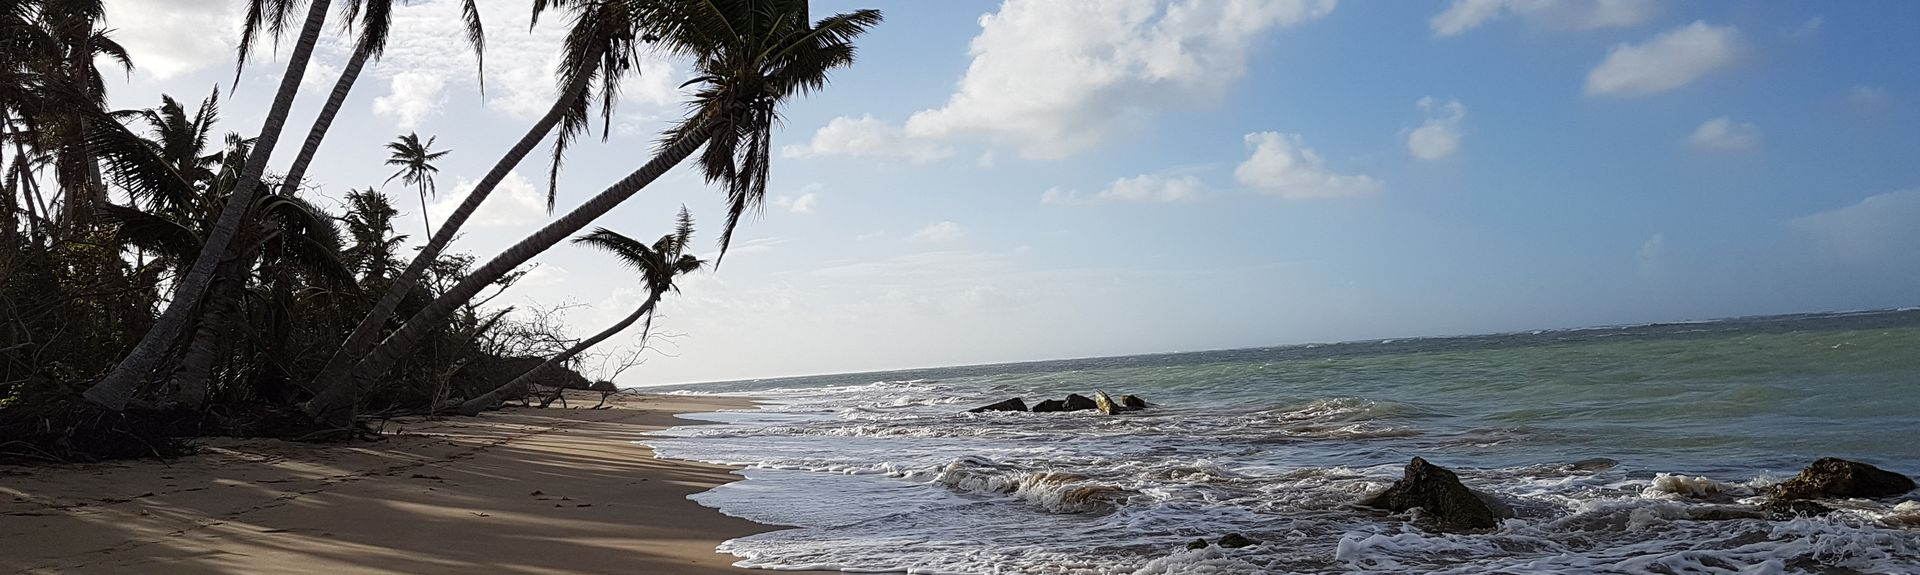 Las Carreras, Loiza, Porto Rico